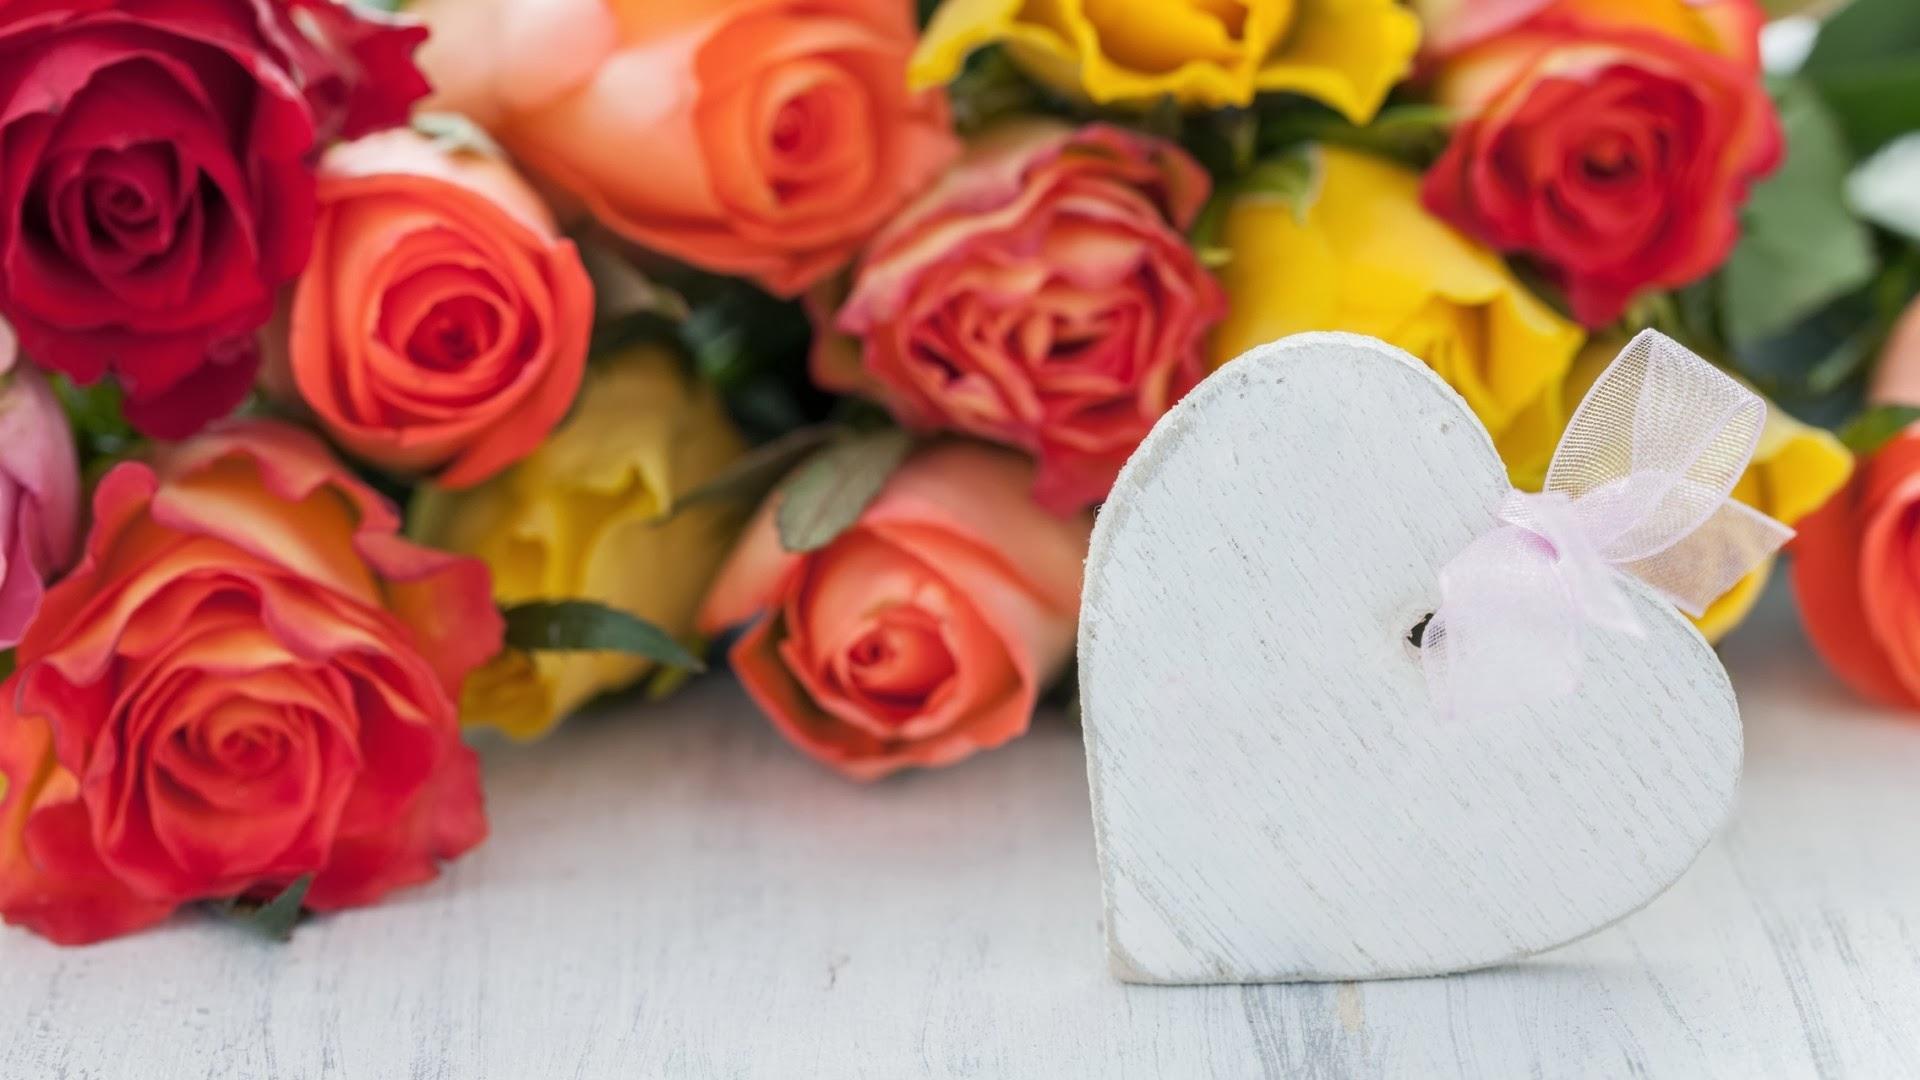 Imágenes de Rosas de Amor Imágenes de Amor - Imagenes De Ramos De Rosas Para San Valentin